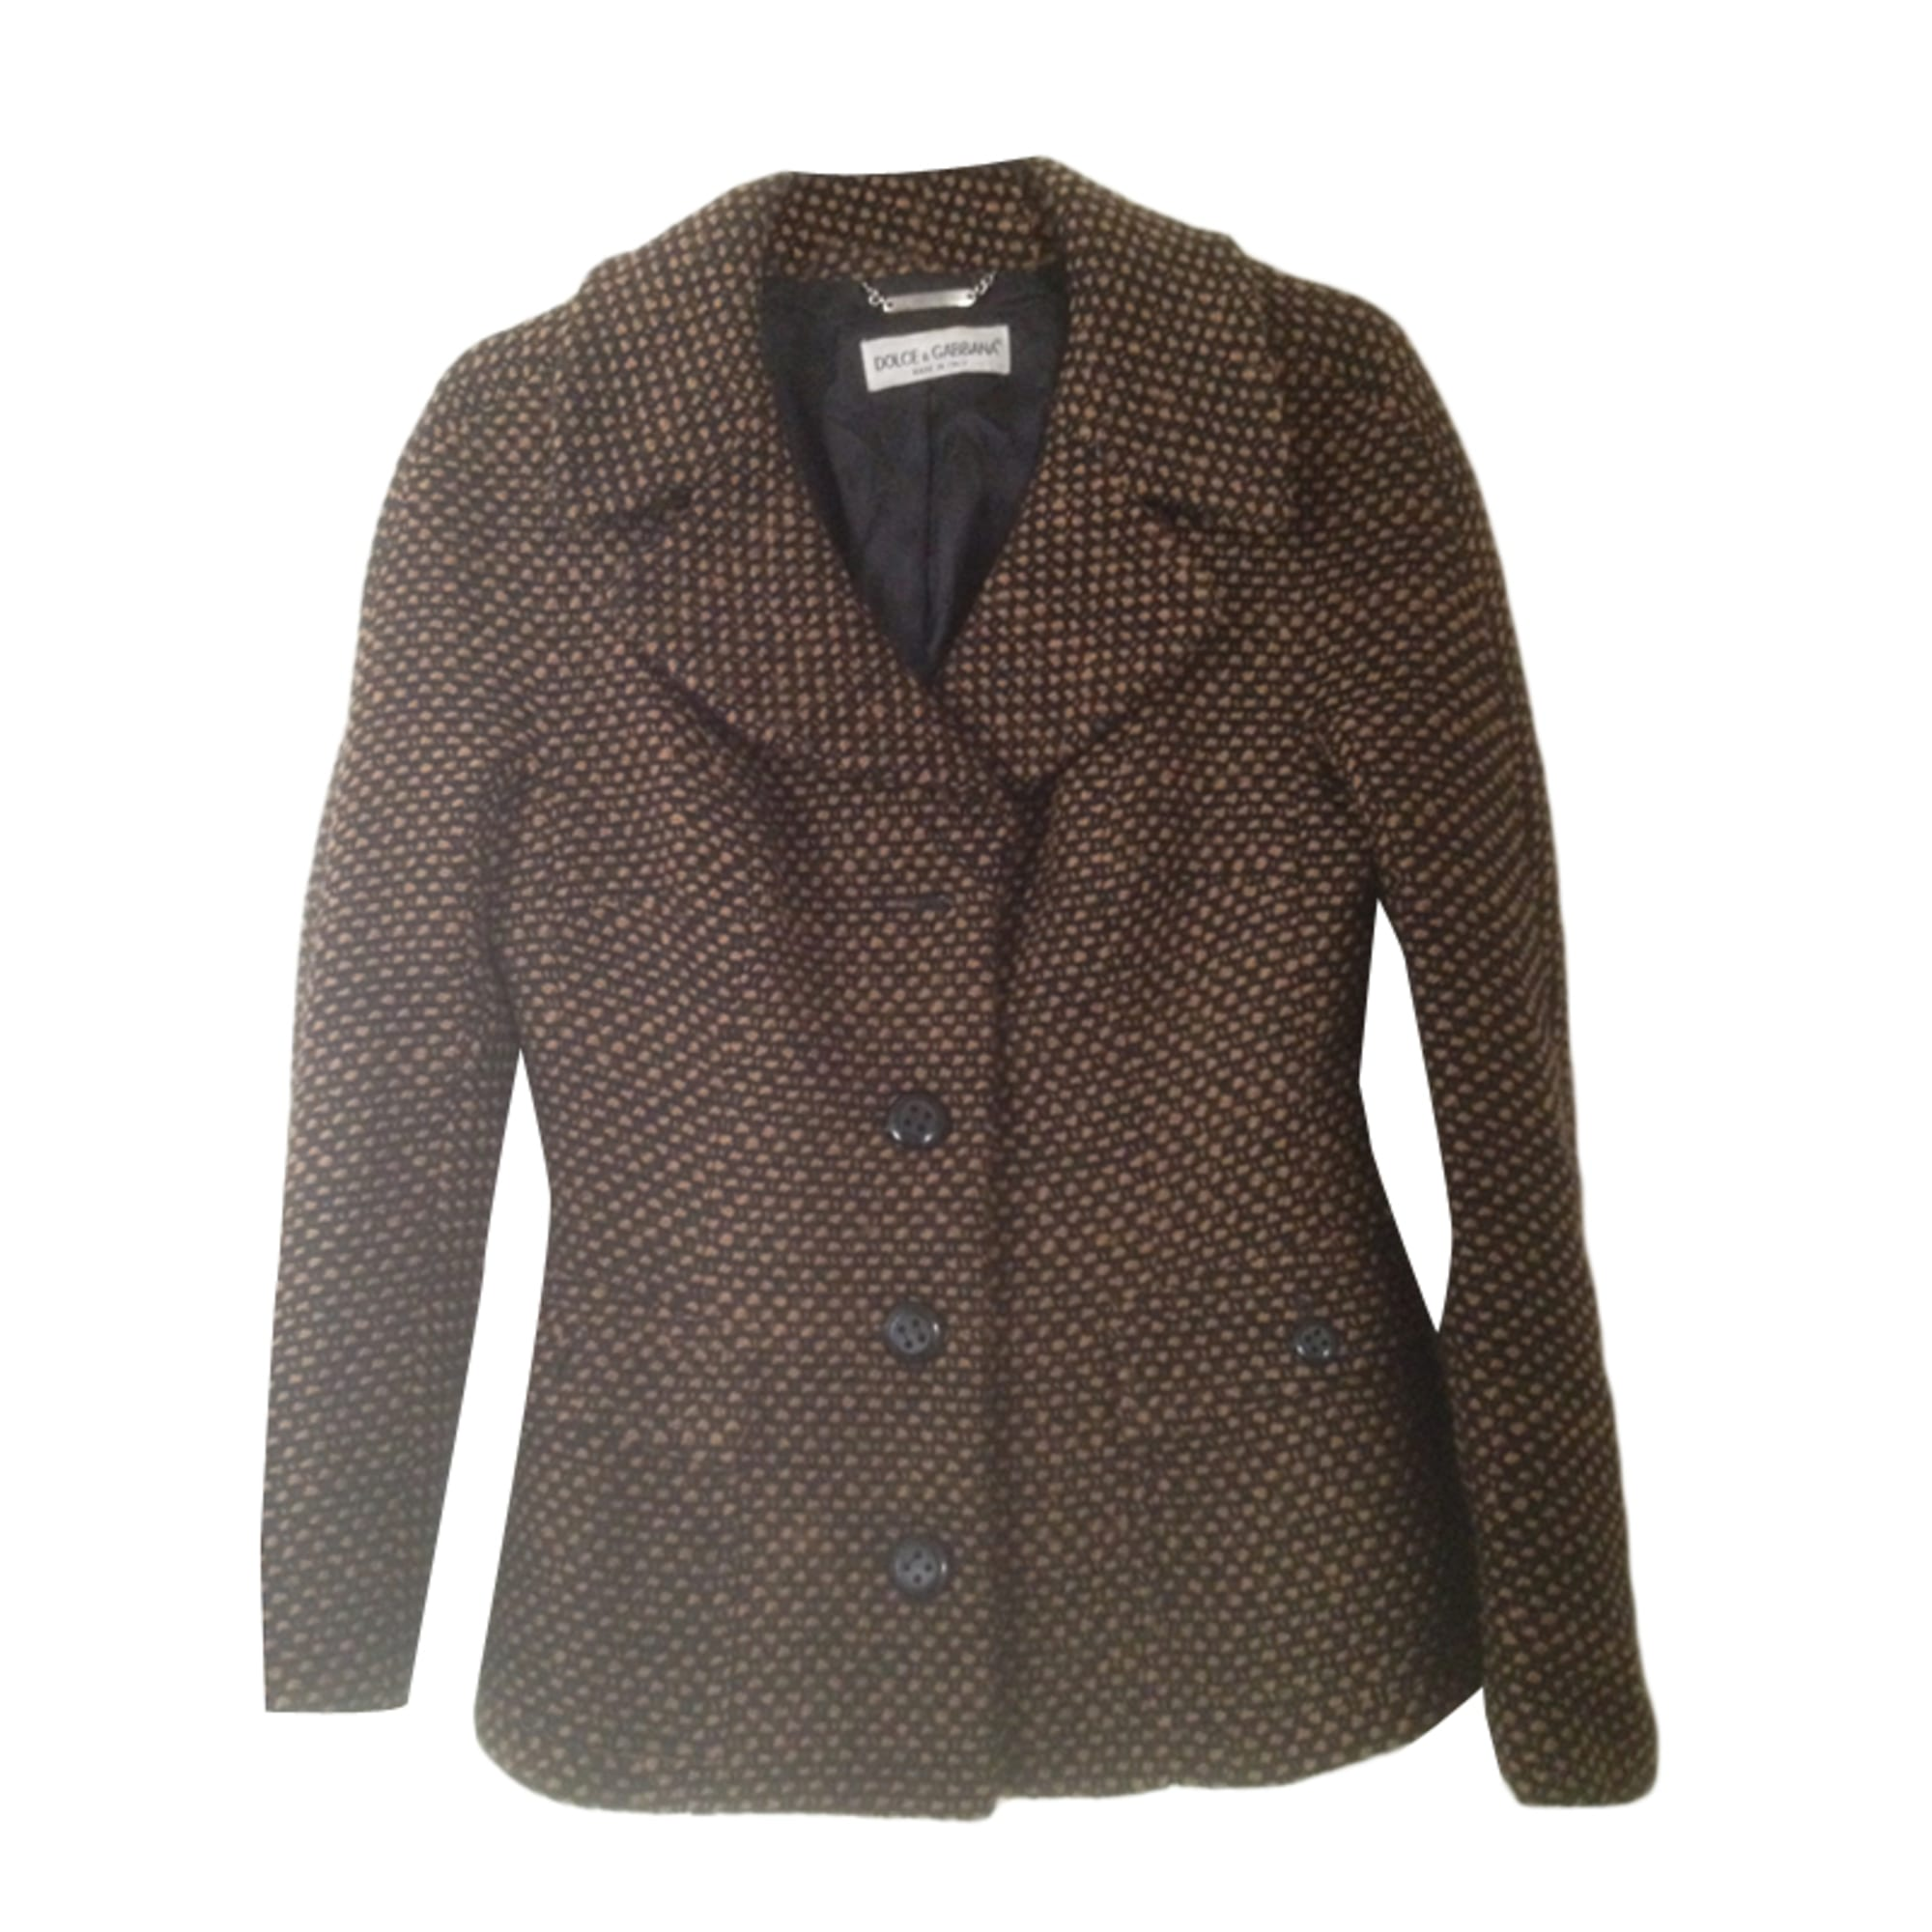 Blazer, veste tailleur DOLCE & GABBANA Marron